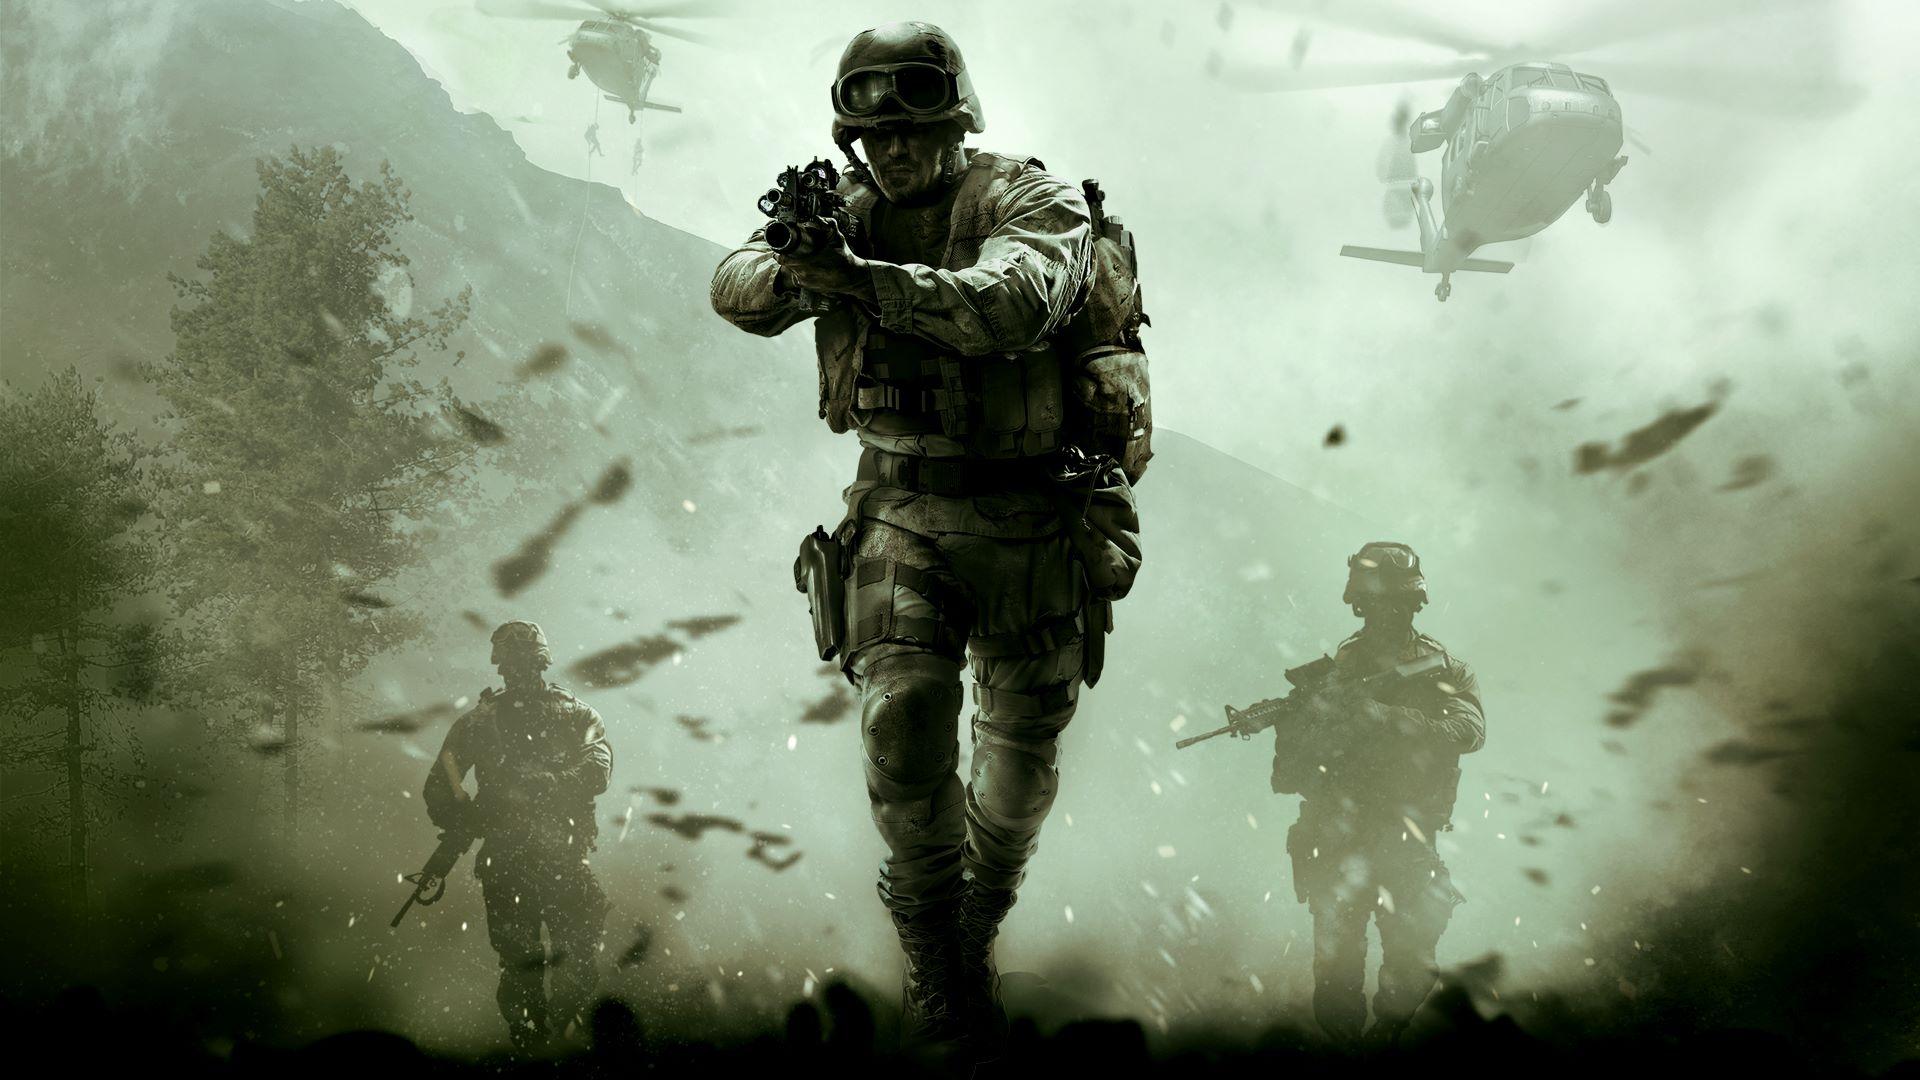 call-of-duty-modern-warfare-remastered-sera-gratis-como-parte-de-ps-plus-en-marzo-frikigamers.com